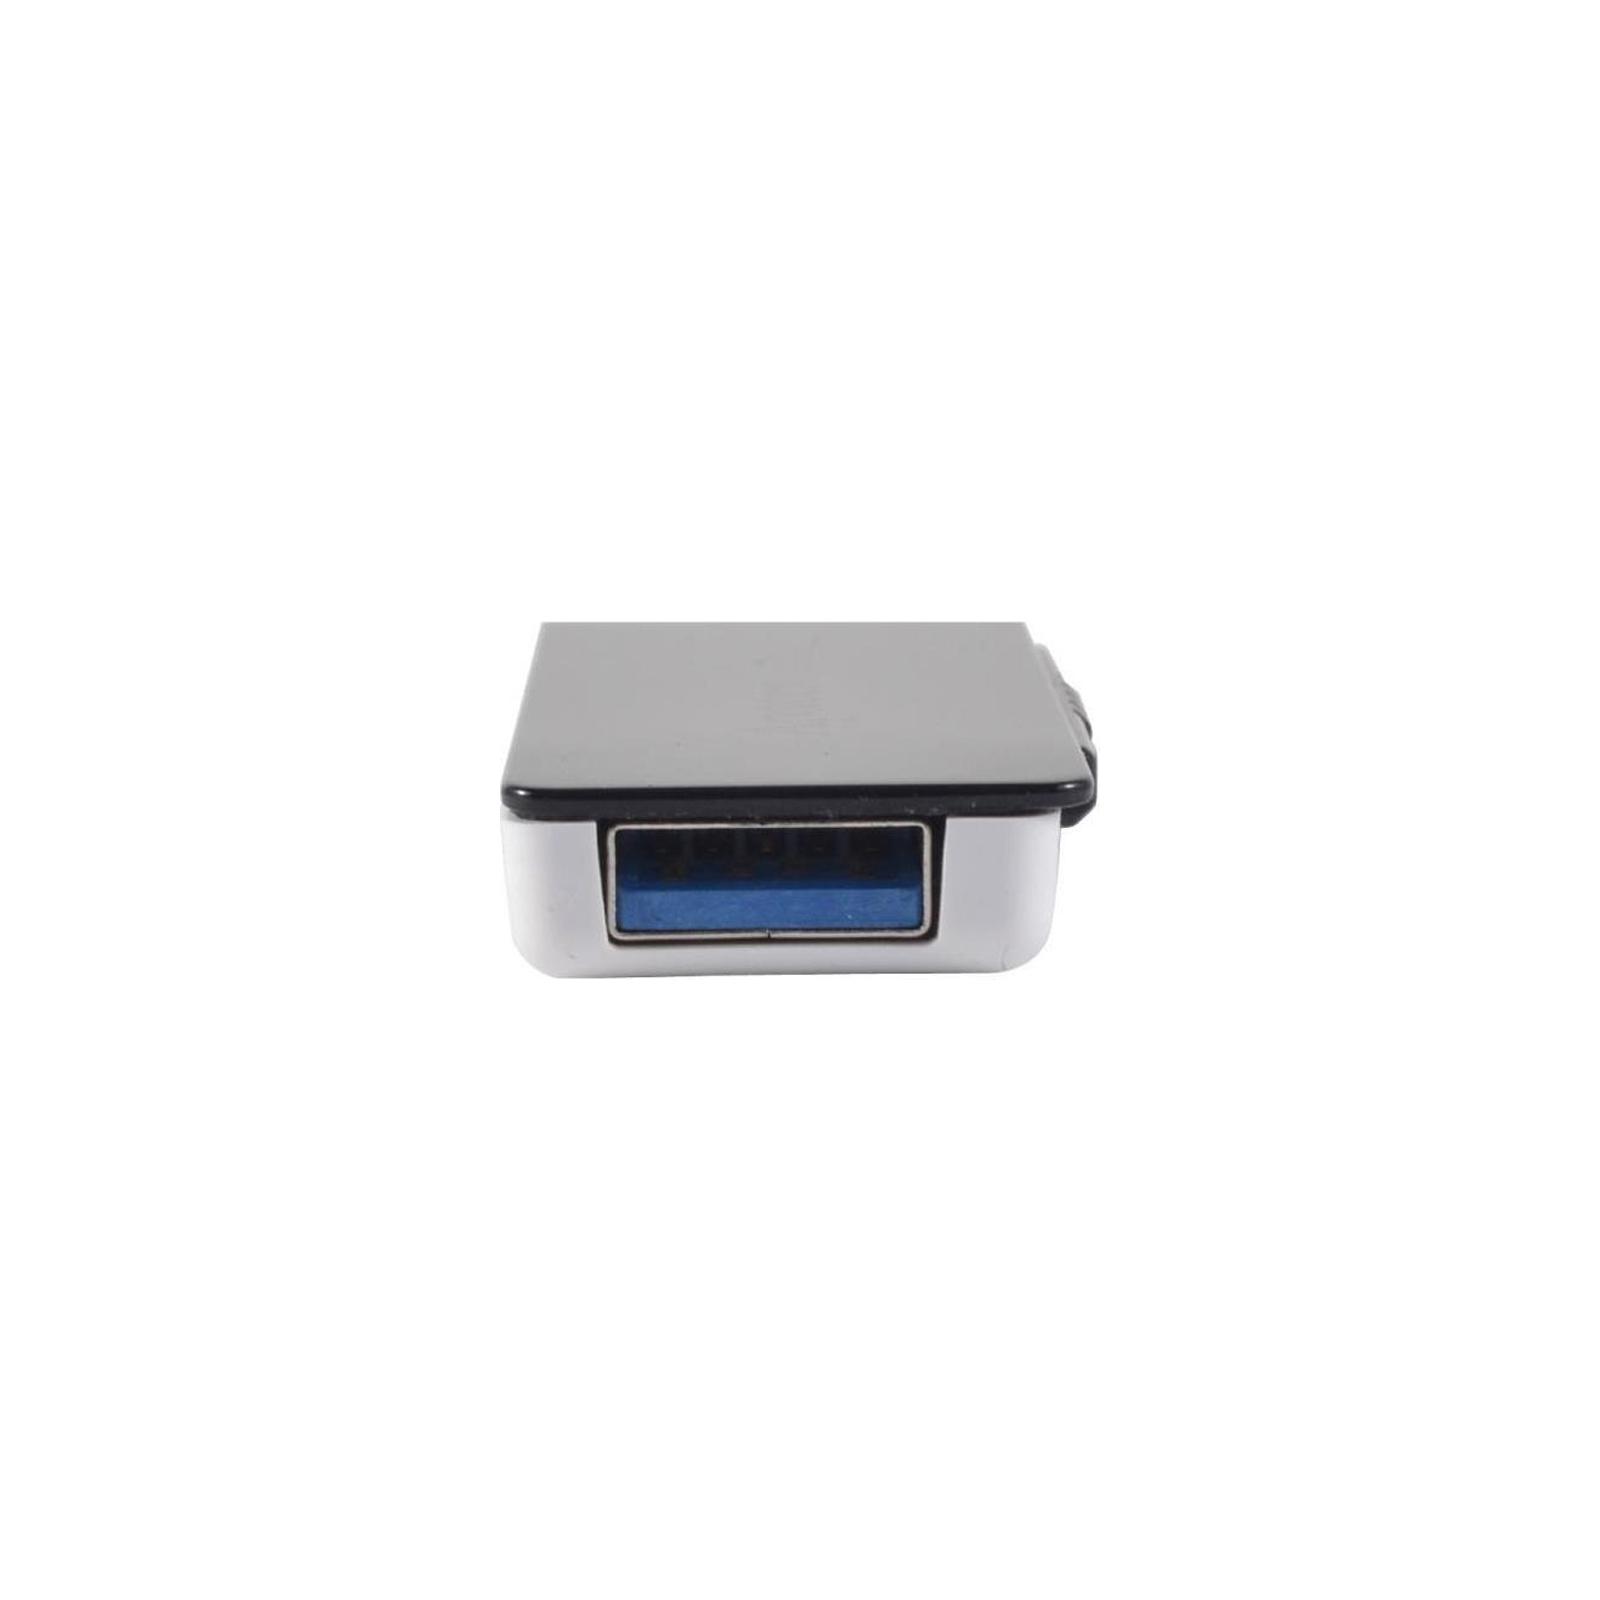 USB флеш накопитель 128GB AH350 Black RP USB3.0 Apacer (AP128GAH350B-1) изображение 7